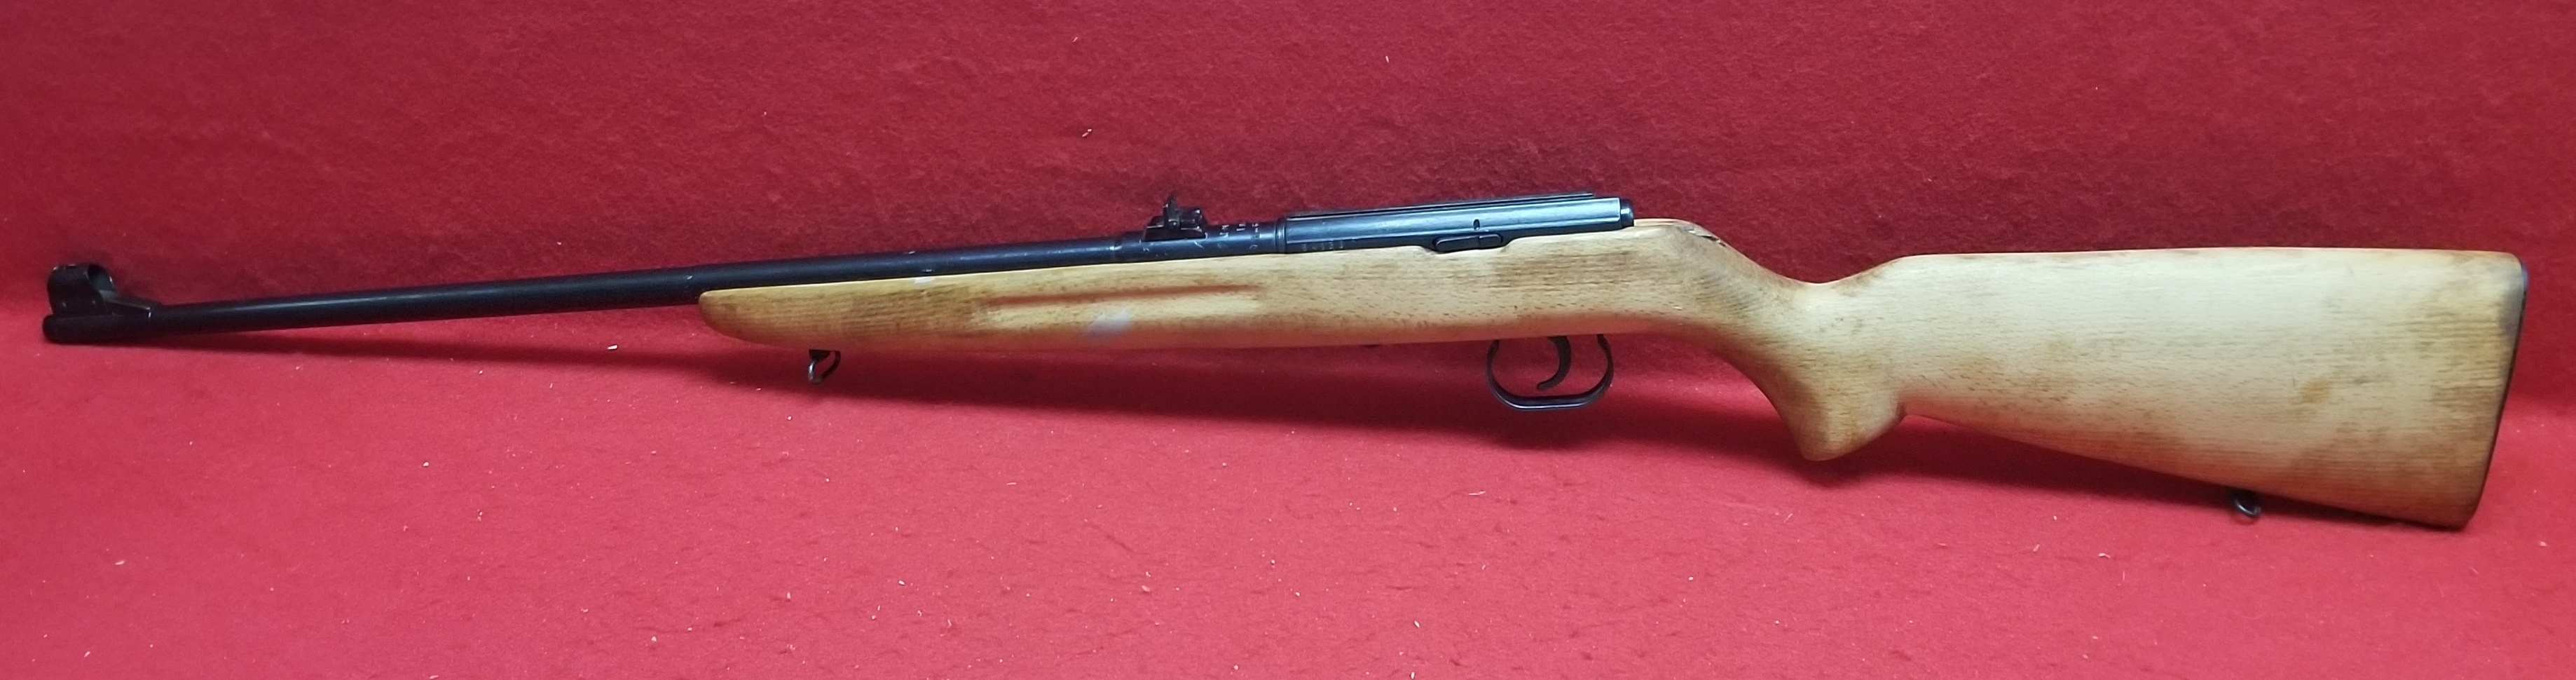 IMC2 1980 22 LR -img-7